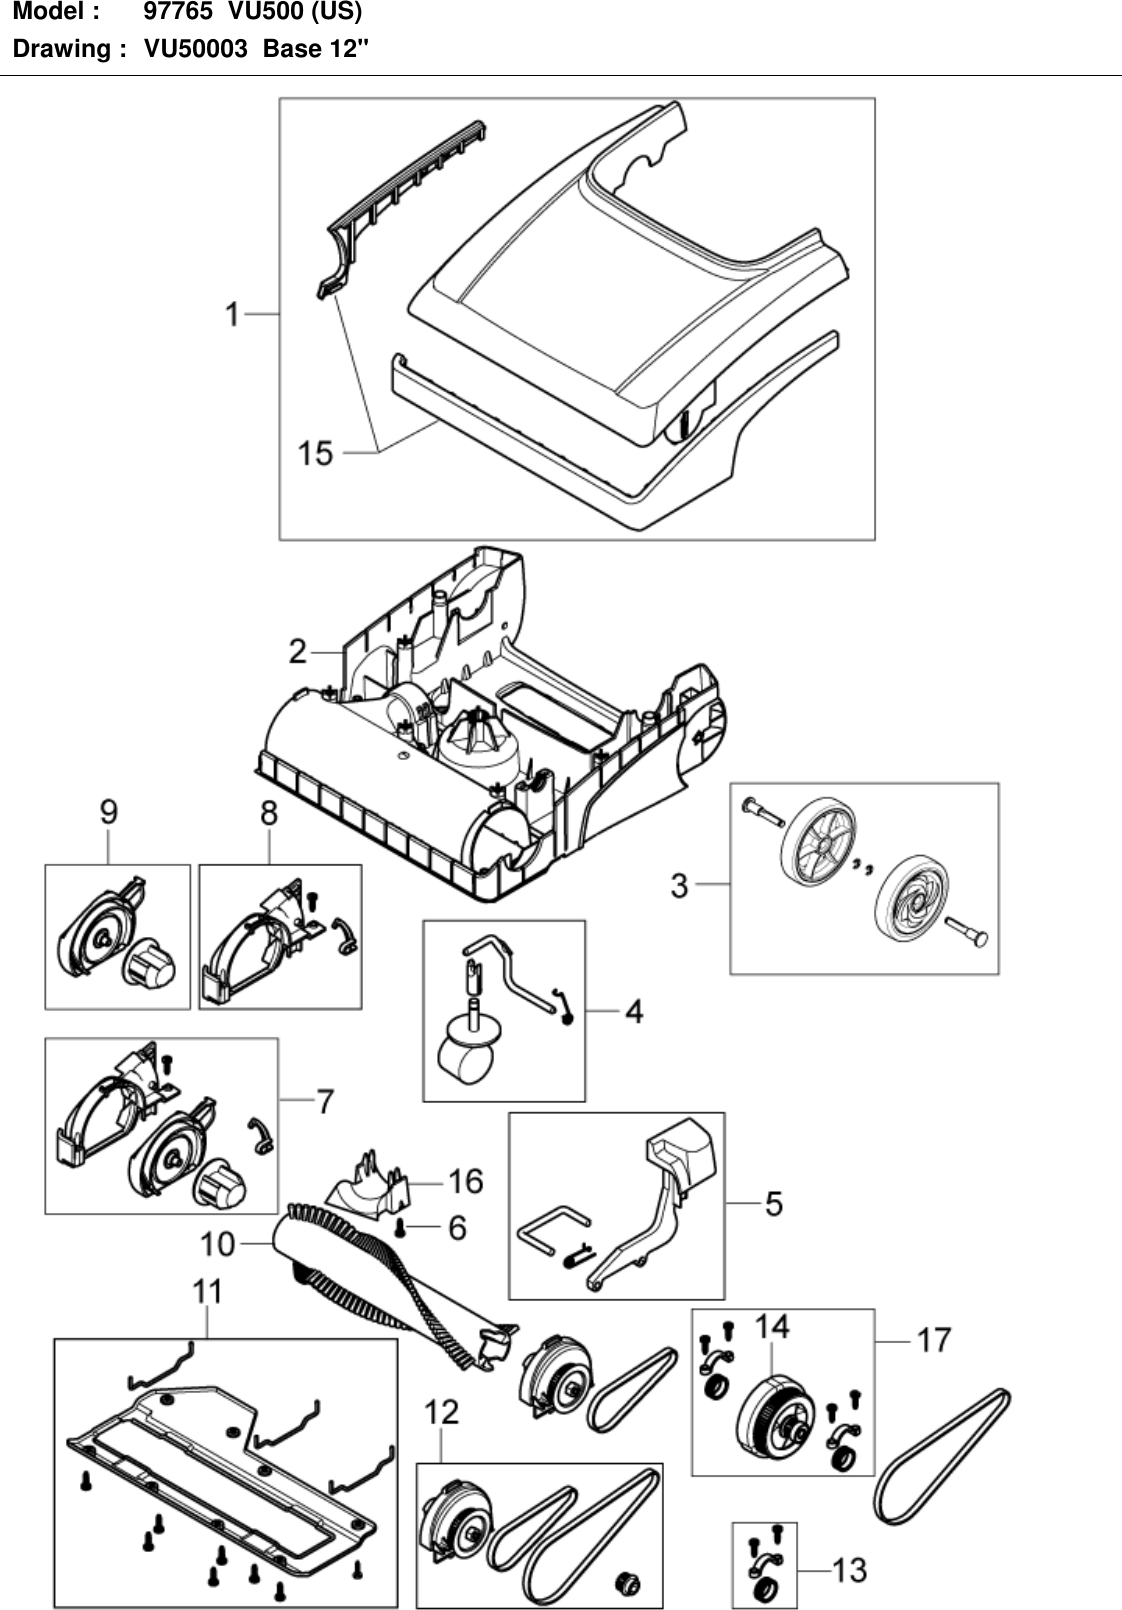 Dyson Vacuum Parts Nz Manual Guide